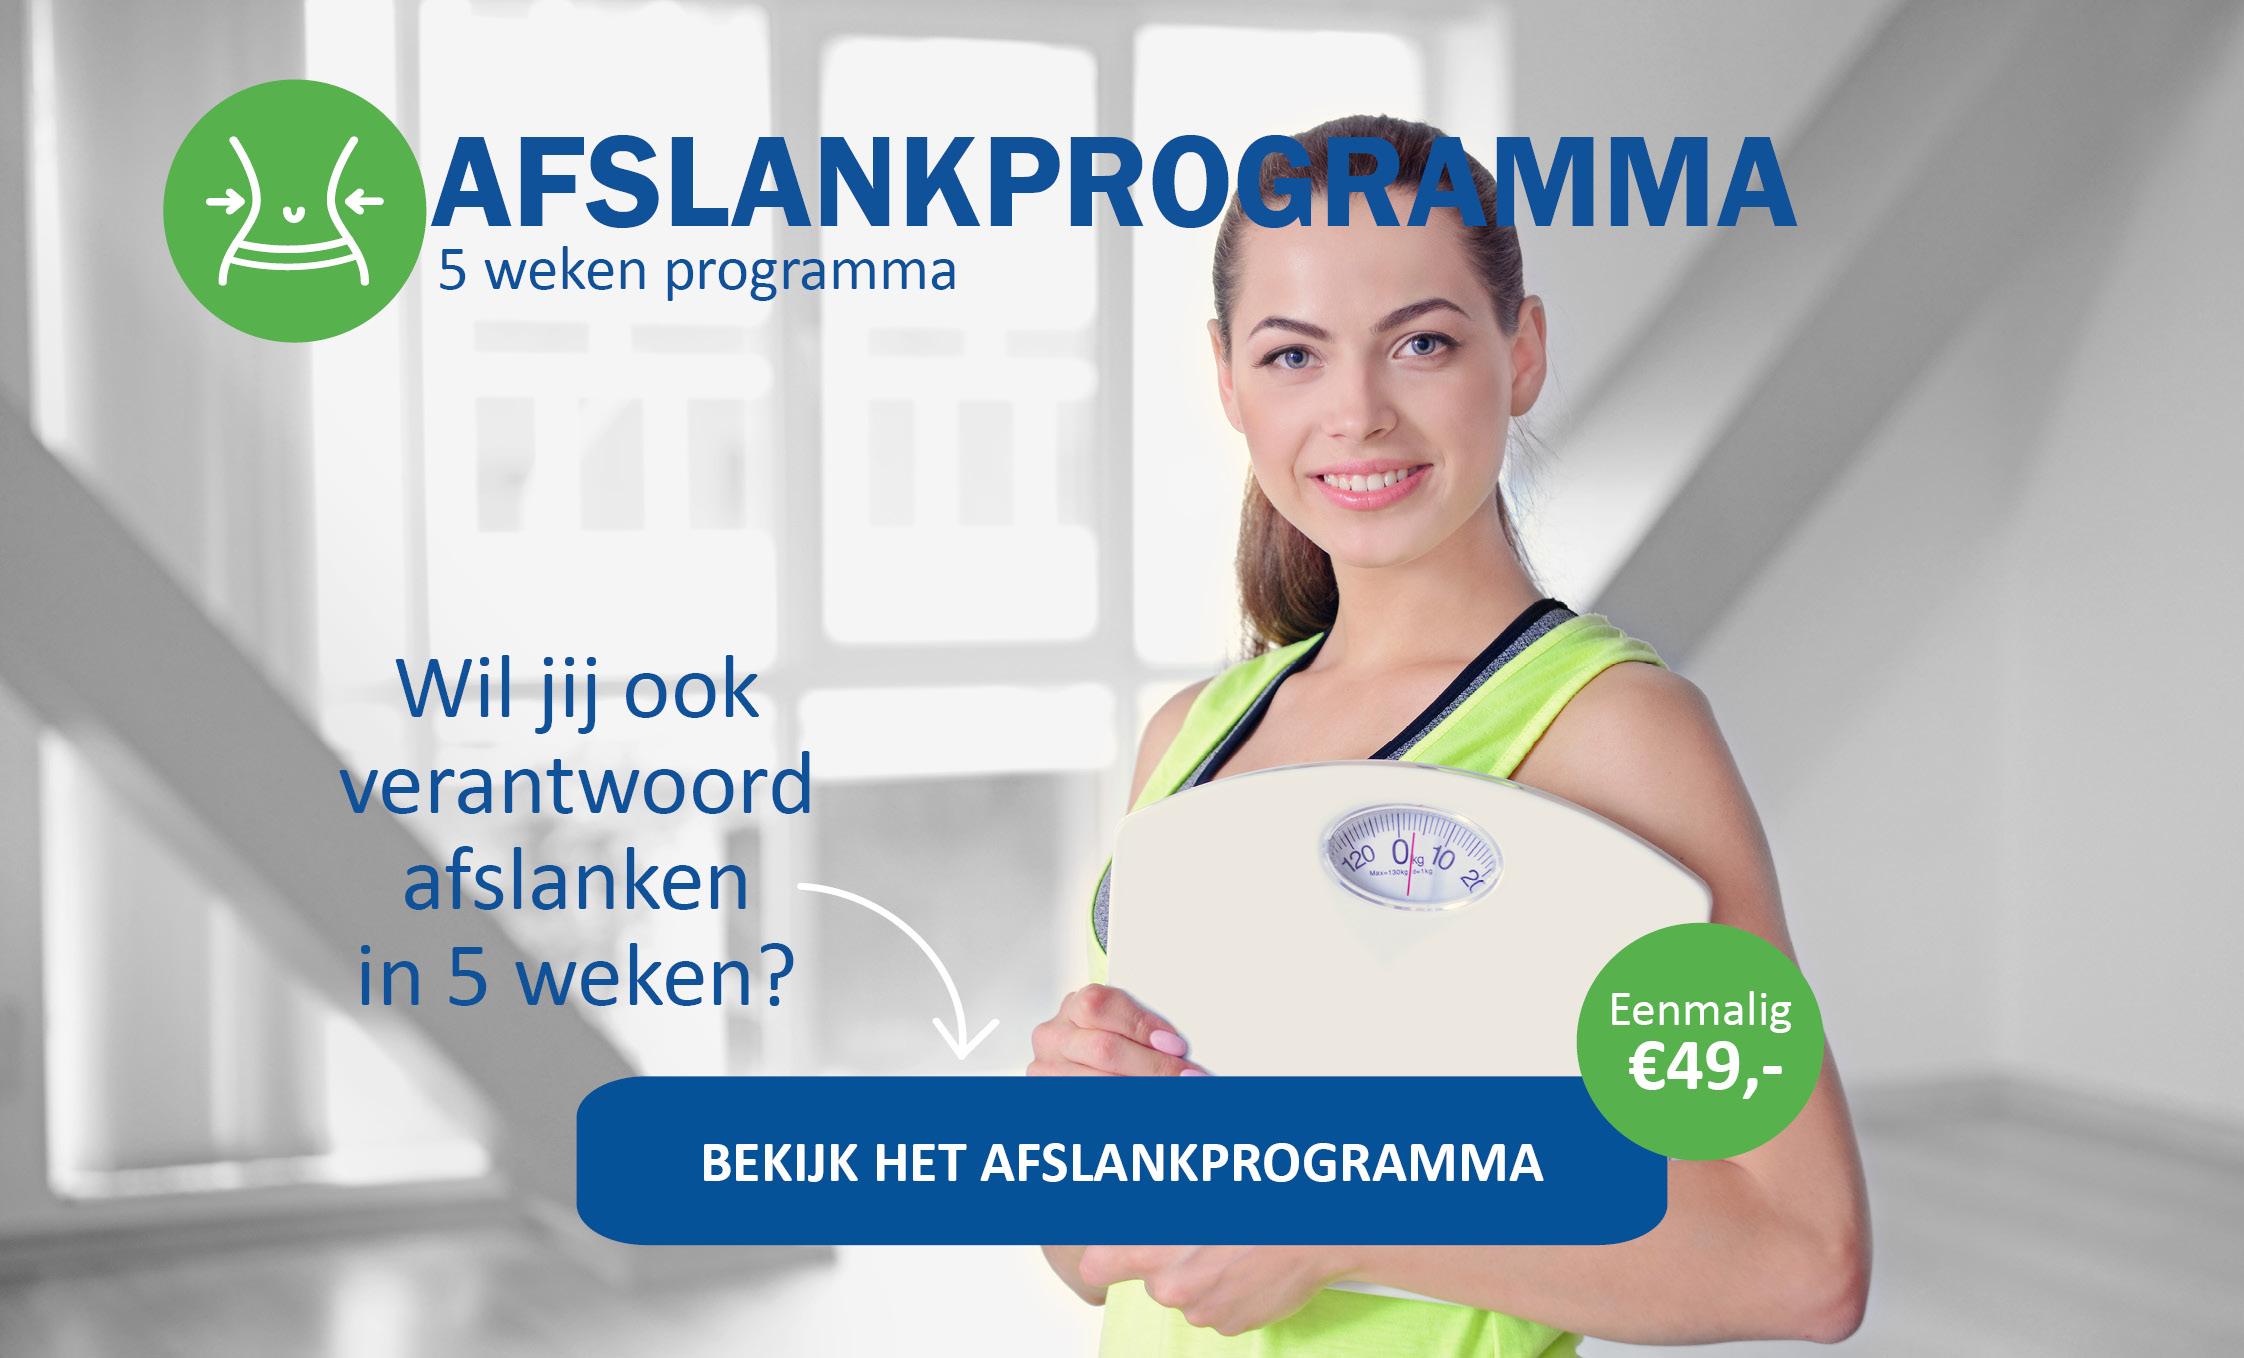 Afslankprogramma